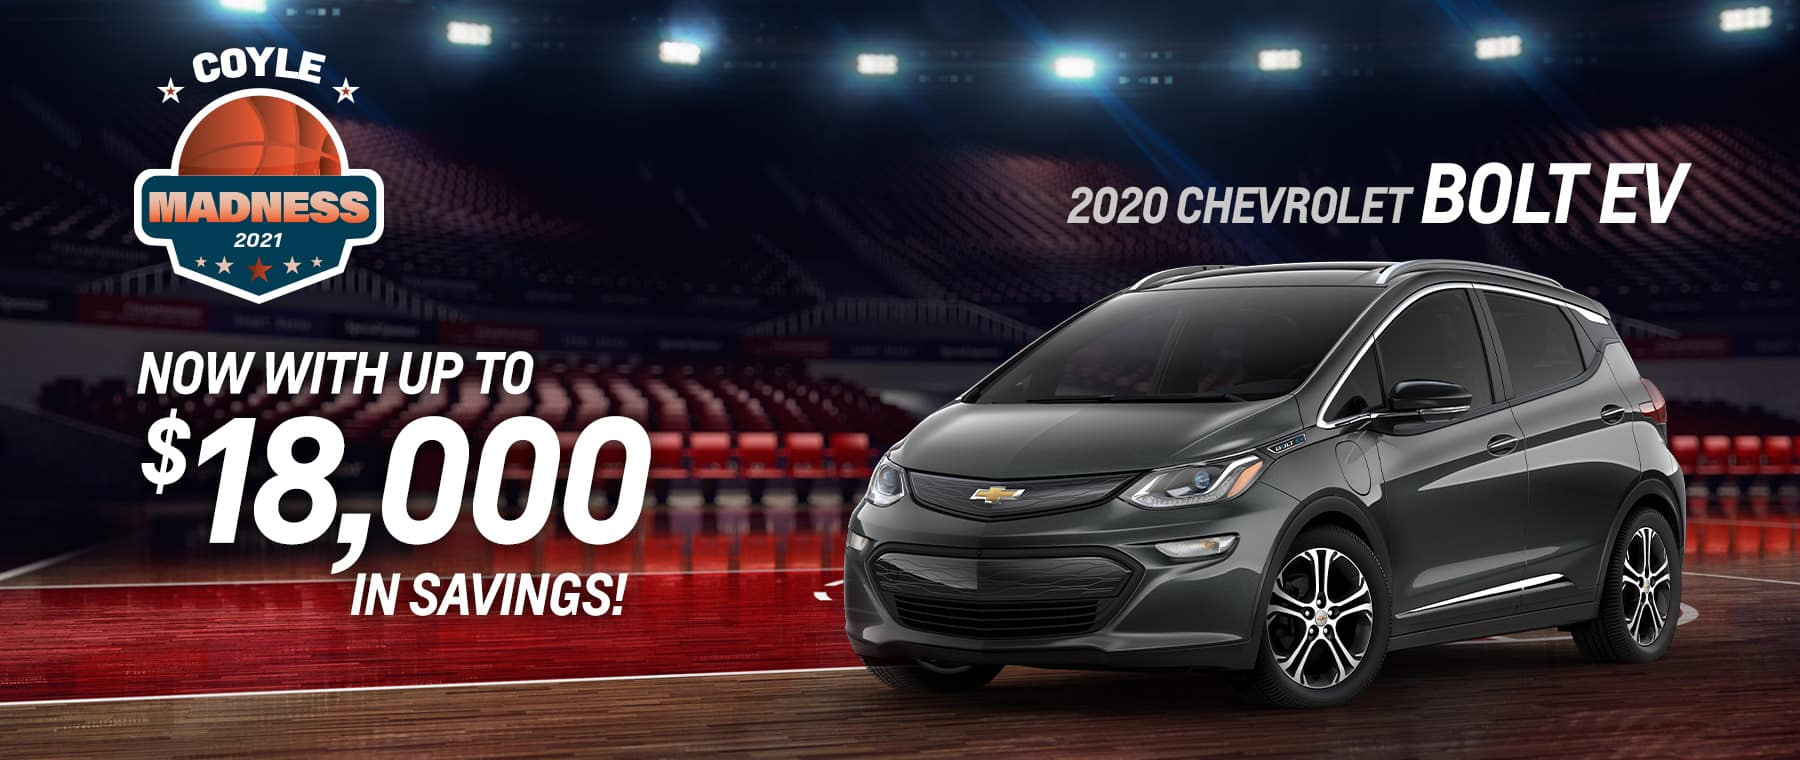 Best rebate offer on a new 2020 Bolt EV near Clarksville IN